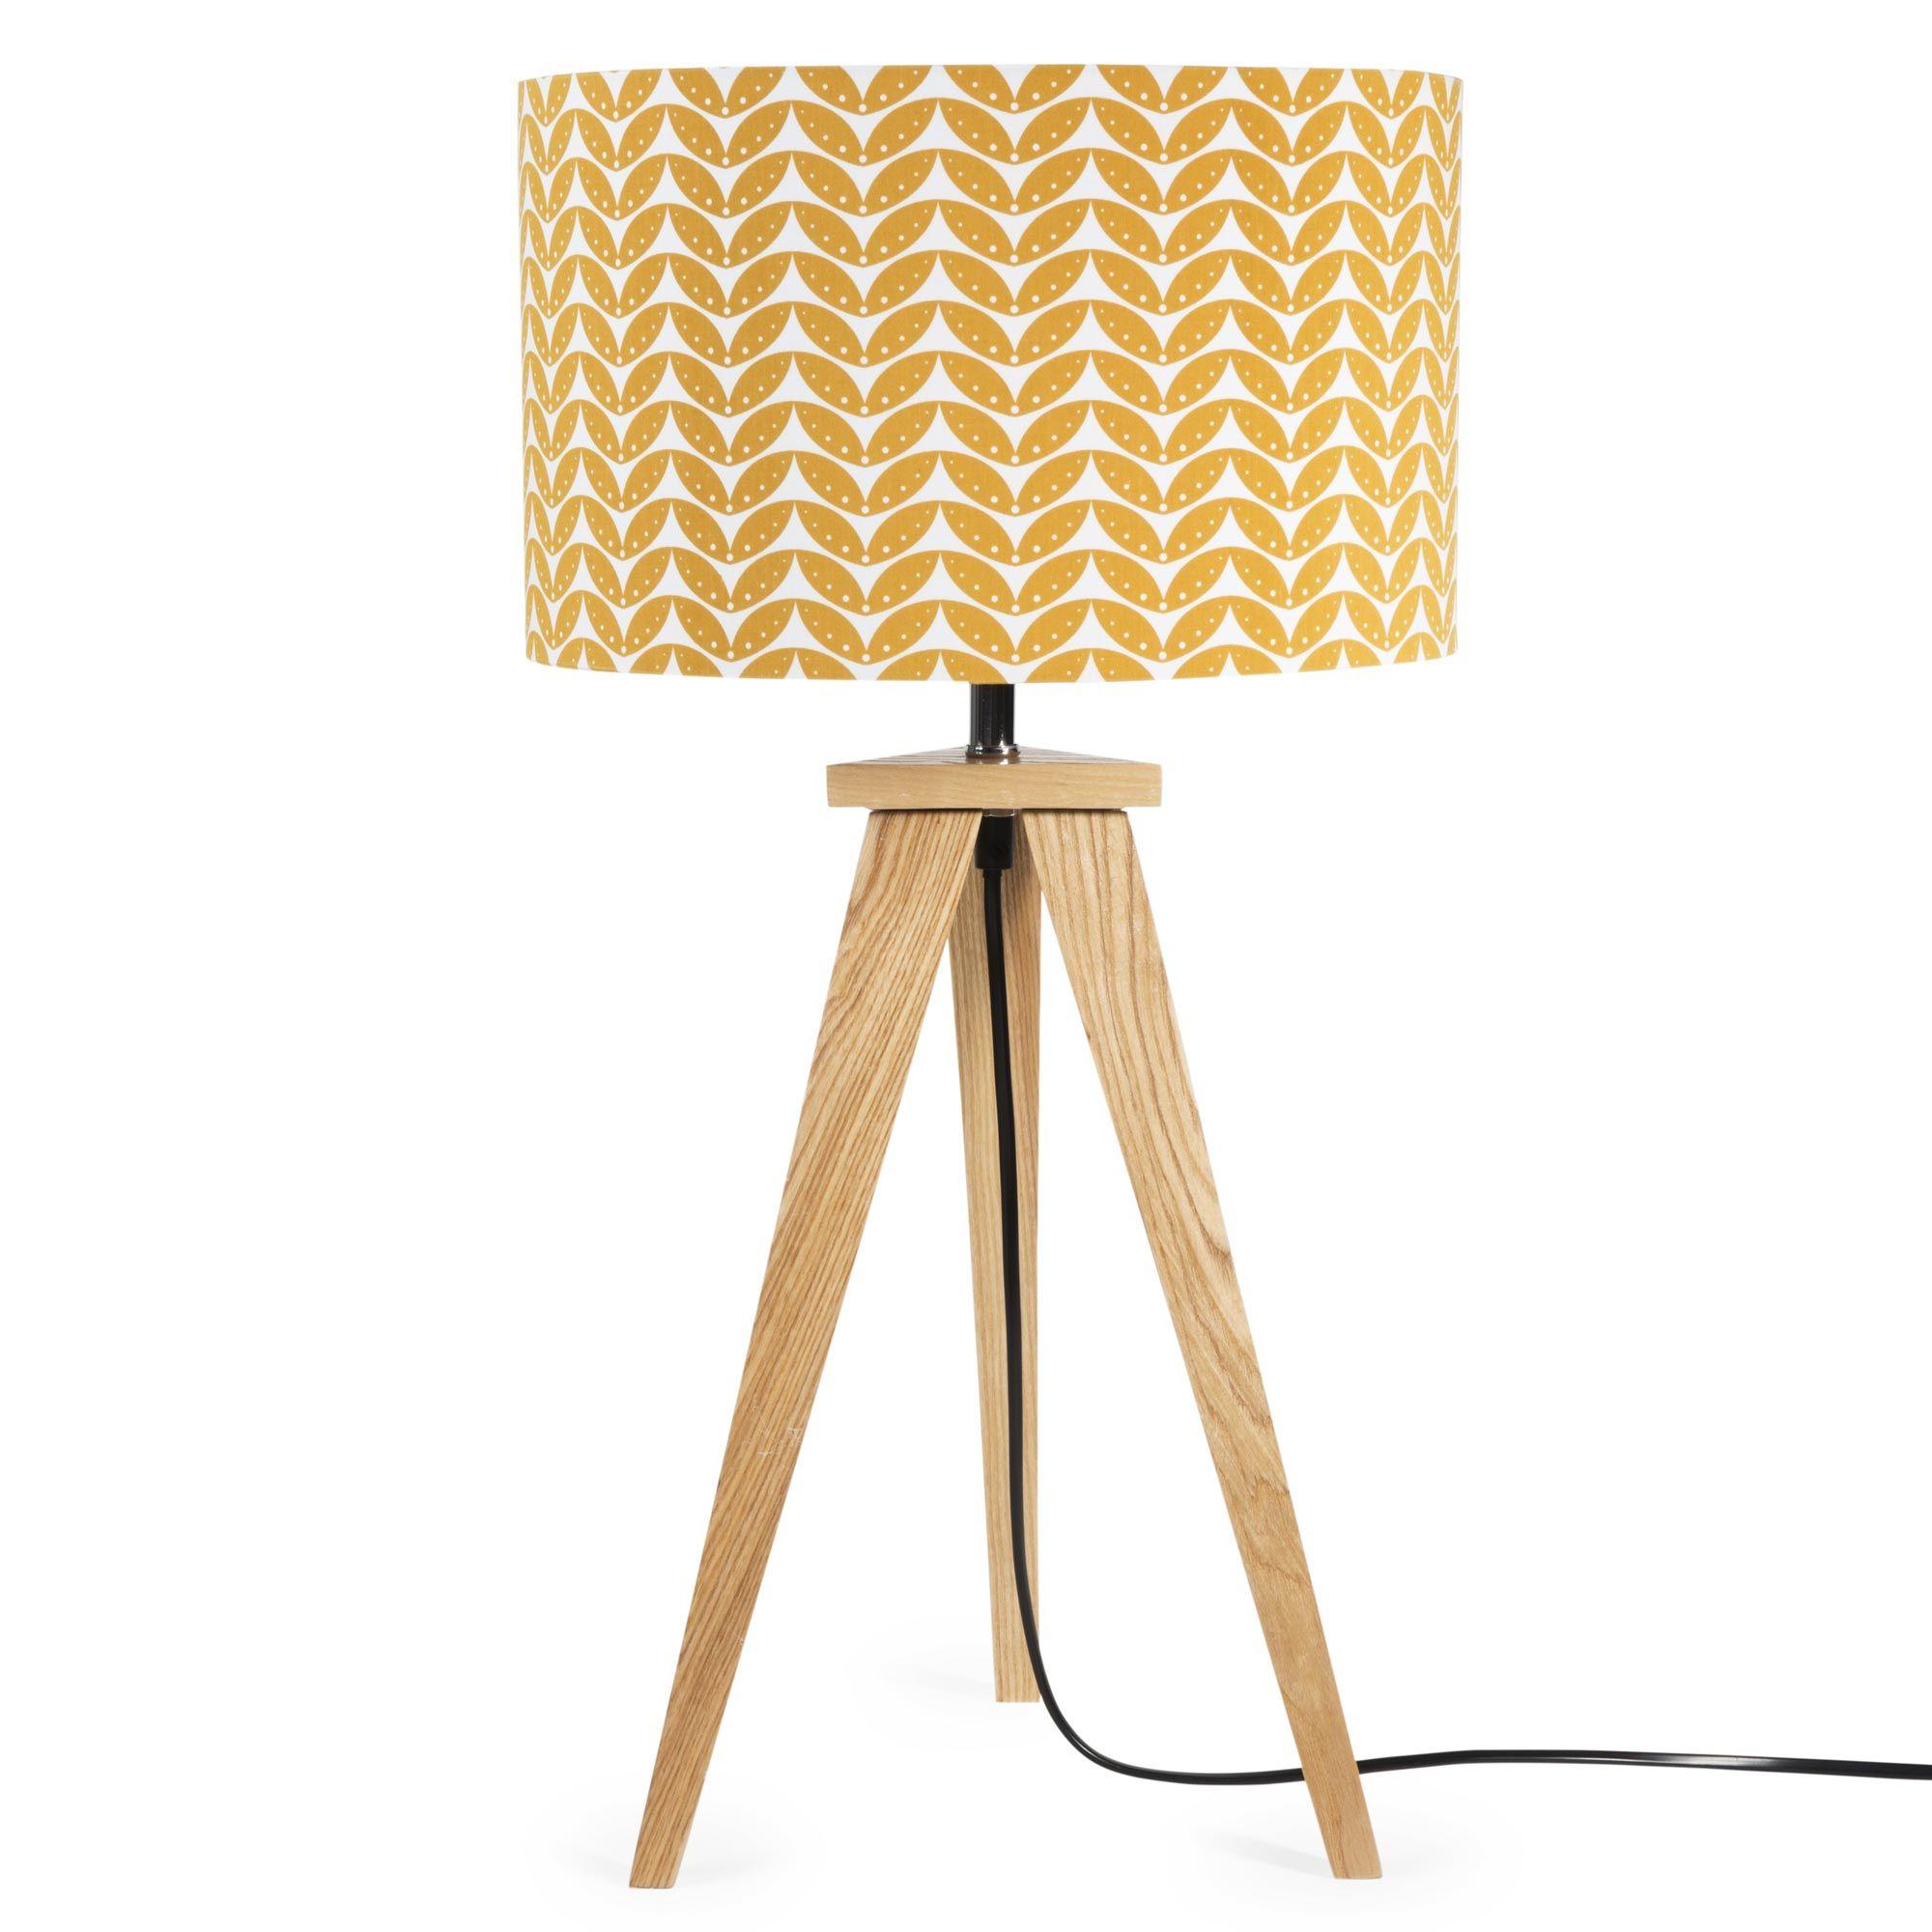 Lampe en toile et bois moutarde H 58 cm BERLIN home